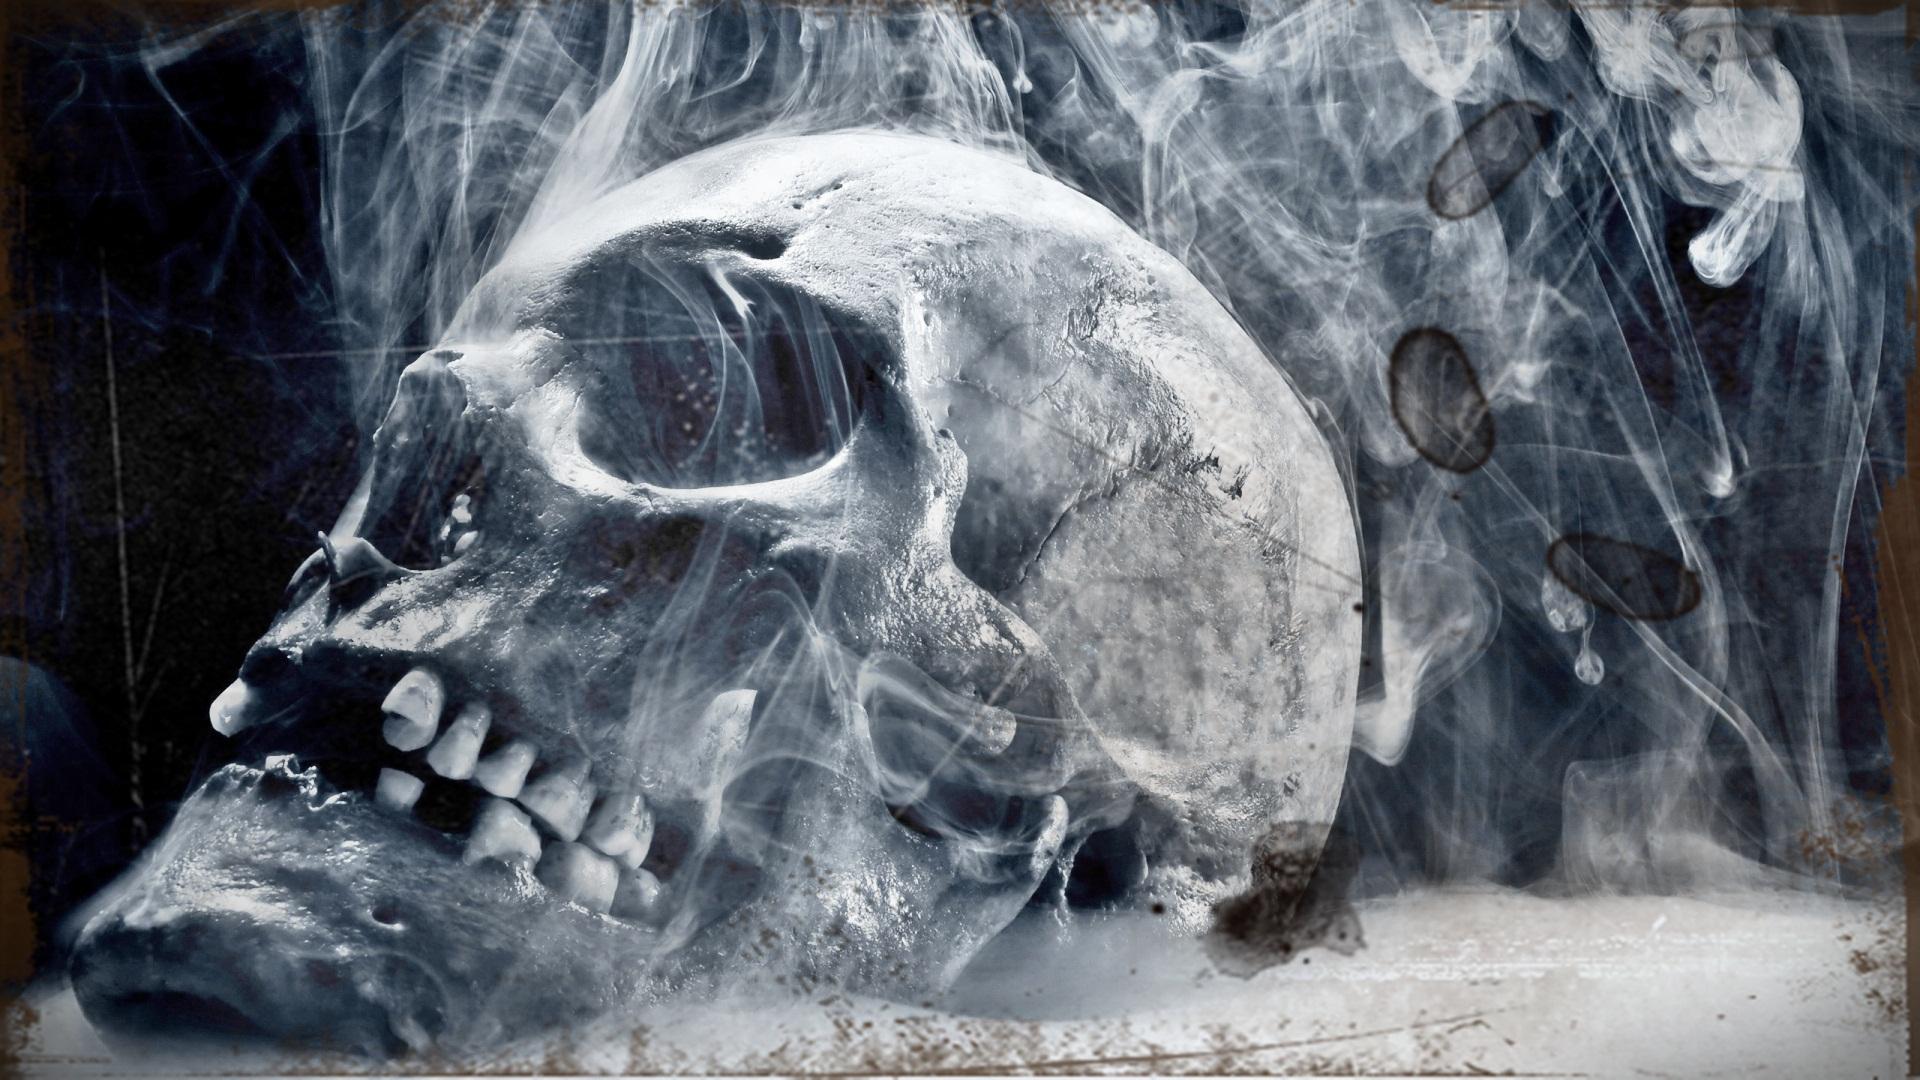 49 ] Free 3d Skull Wallpaper On WallpaperSafari